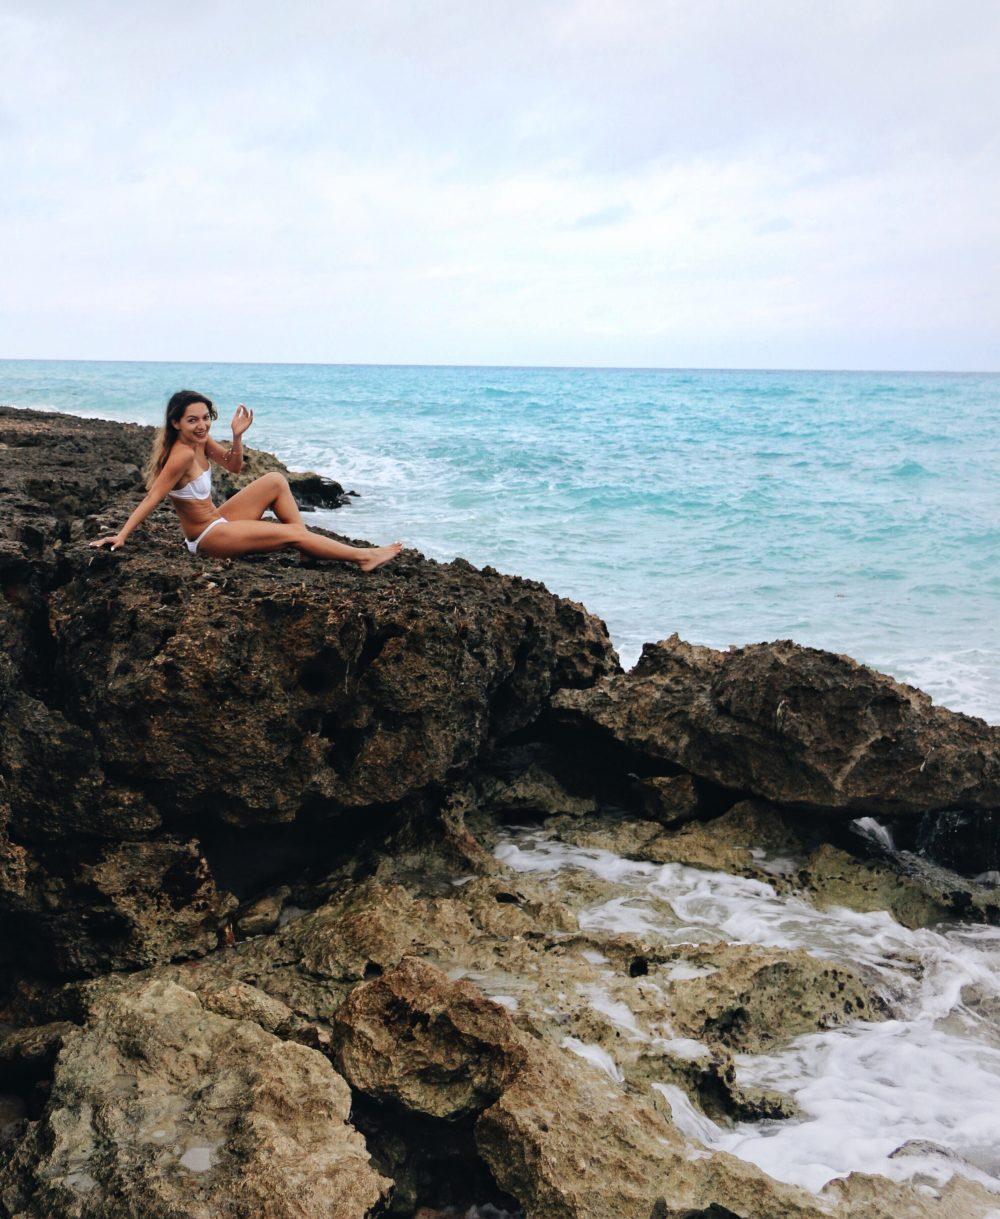 Whitney's Wonderland UK Top Fashion Blogger wearing Wildfox Couture mermaid shell bikini